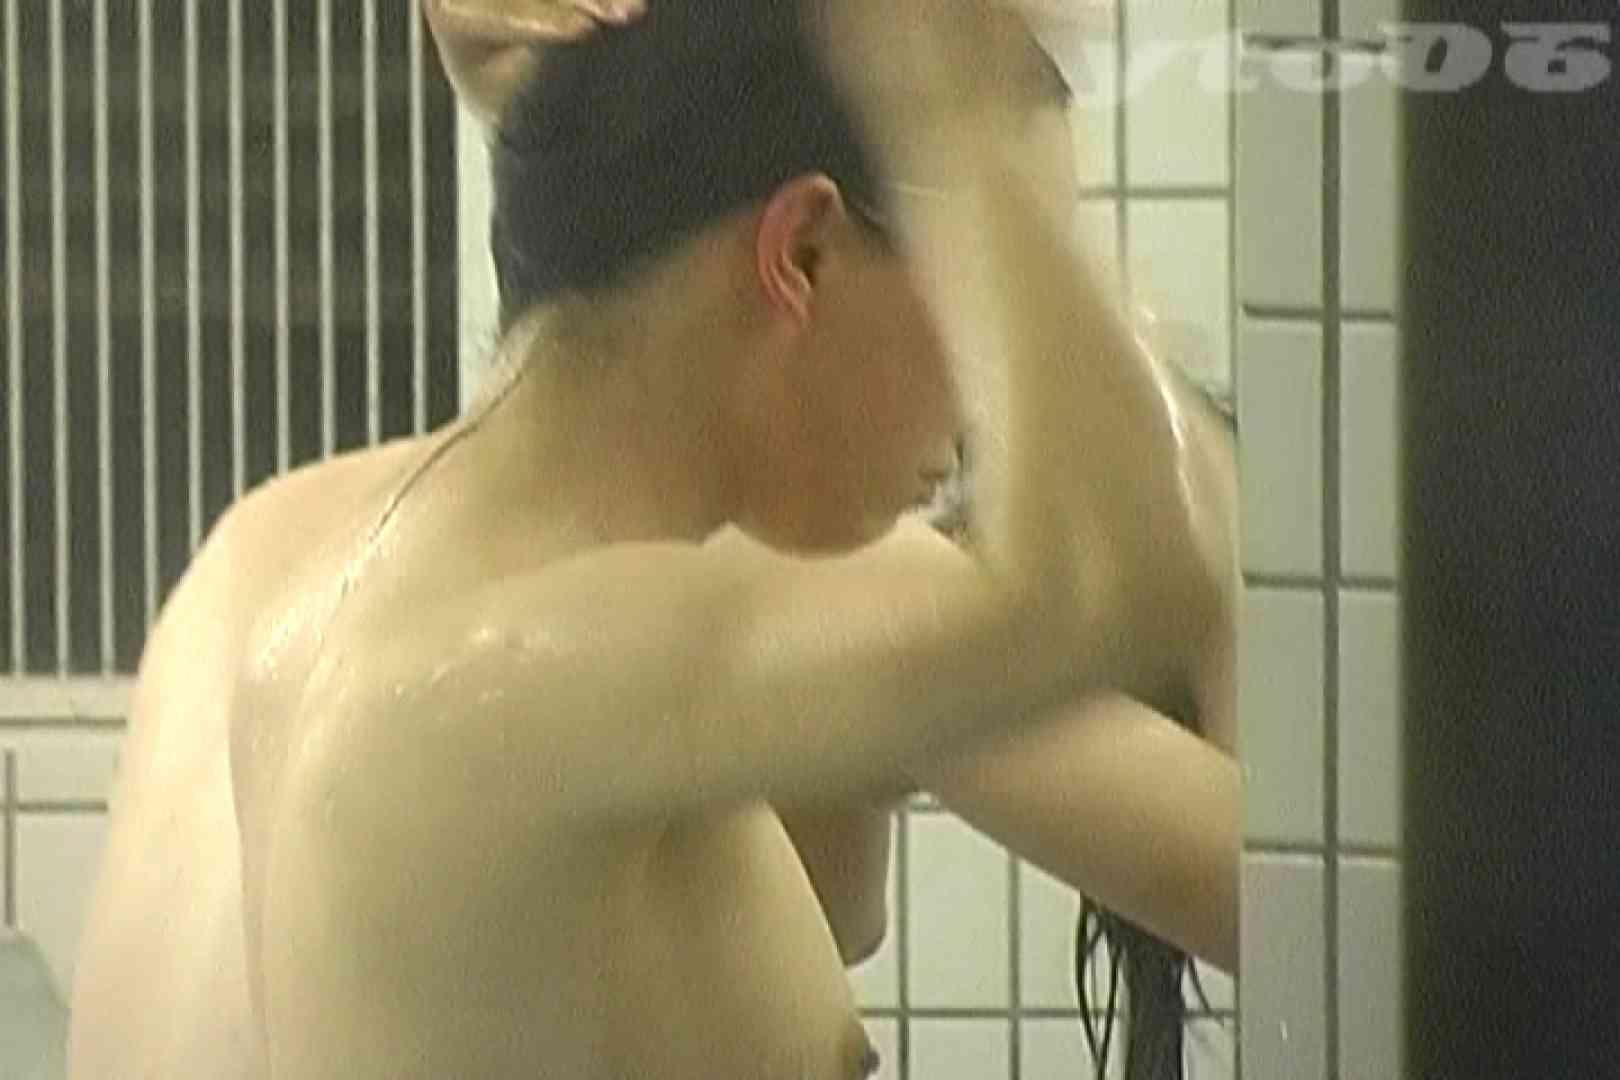 ▲復活限定▲合宿ホテル女風呂盗撮 Vol.36 期間限定 エロ無料画像 70pic 45